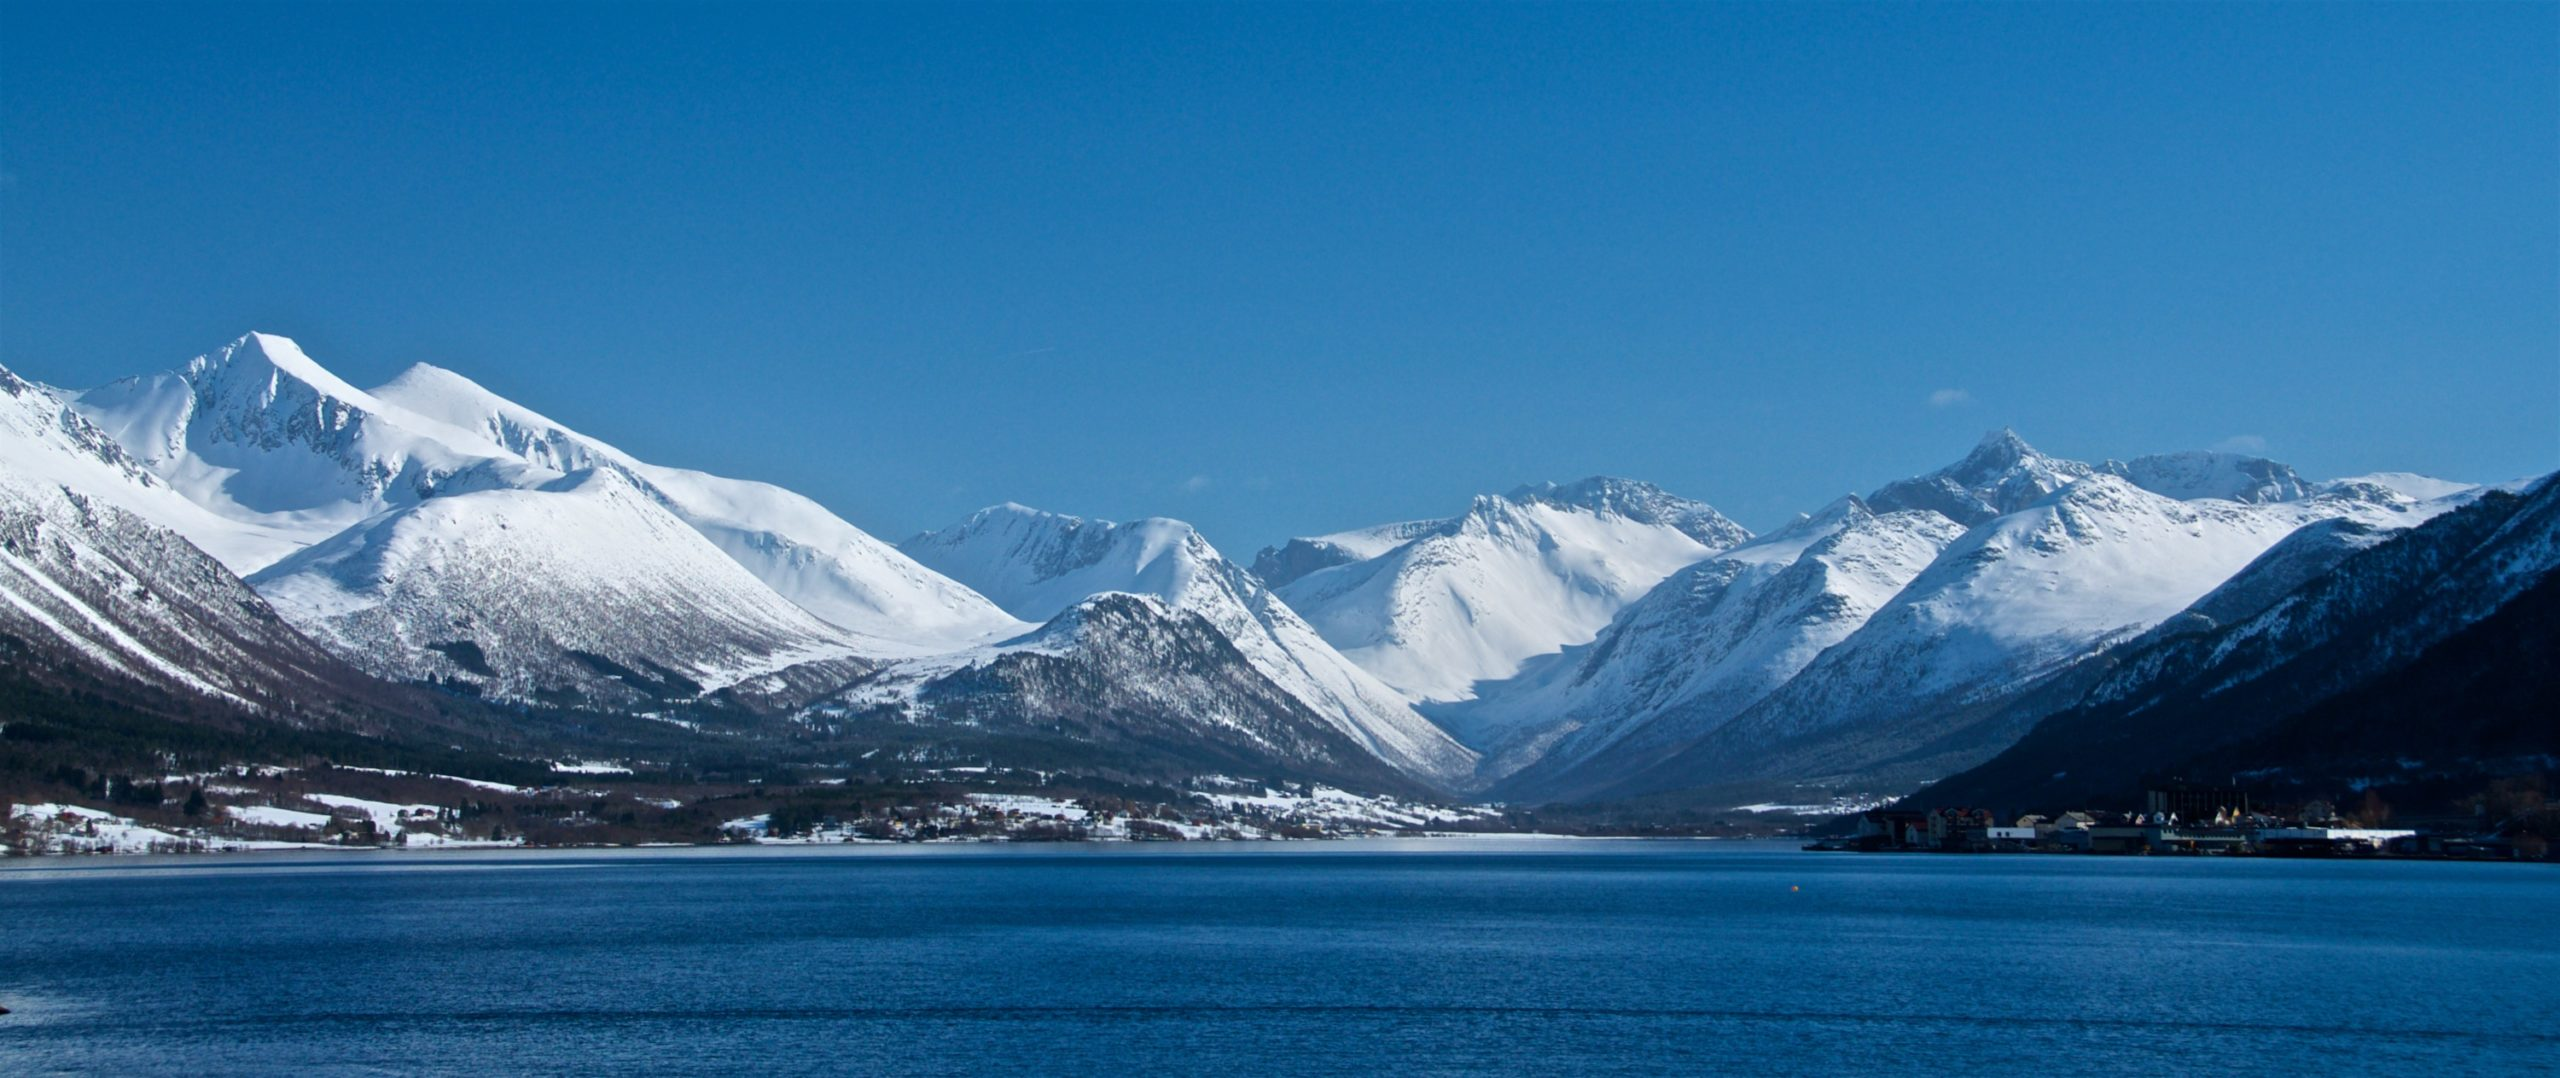 FJORDS NORGE - Isfjorden sett fra Åndalsnes. Kirketaket til venstre.